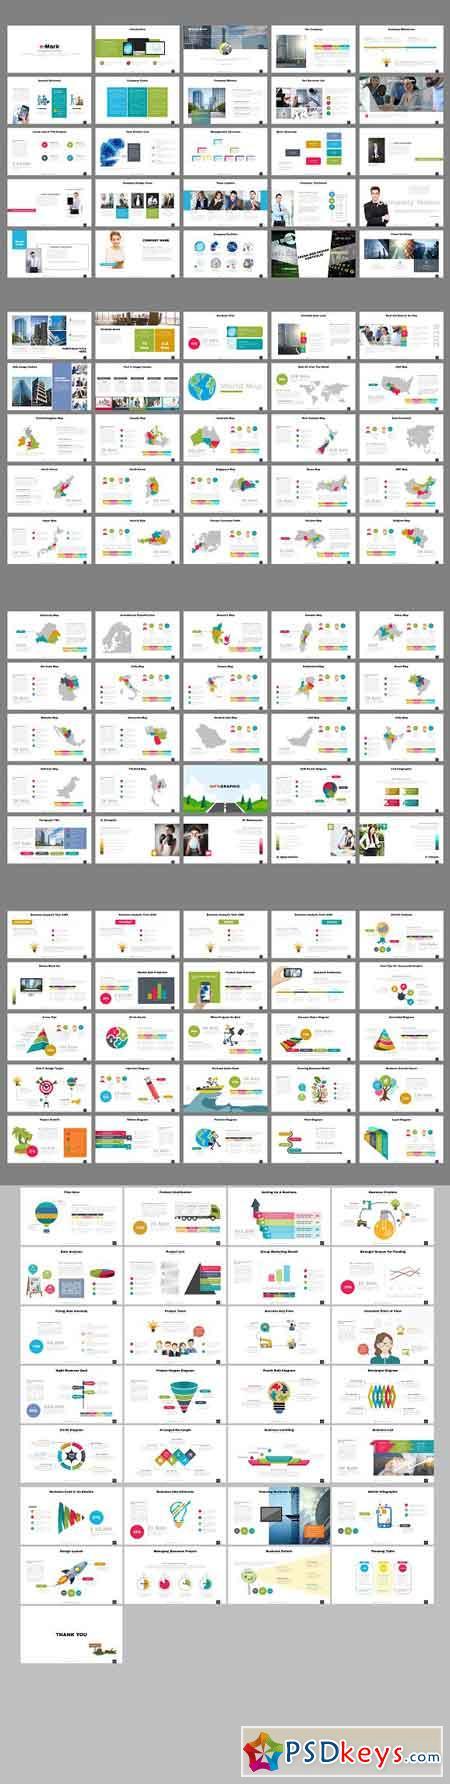 e-Mark Presentation Template 2414672